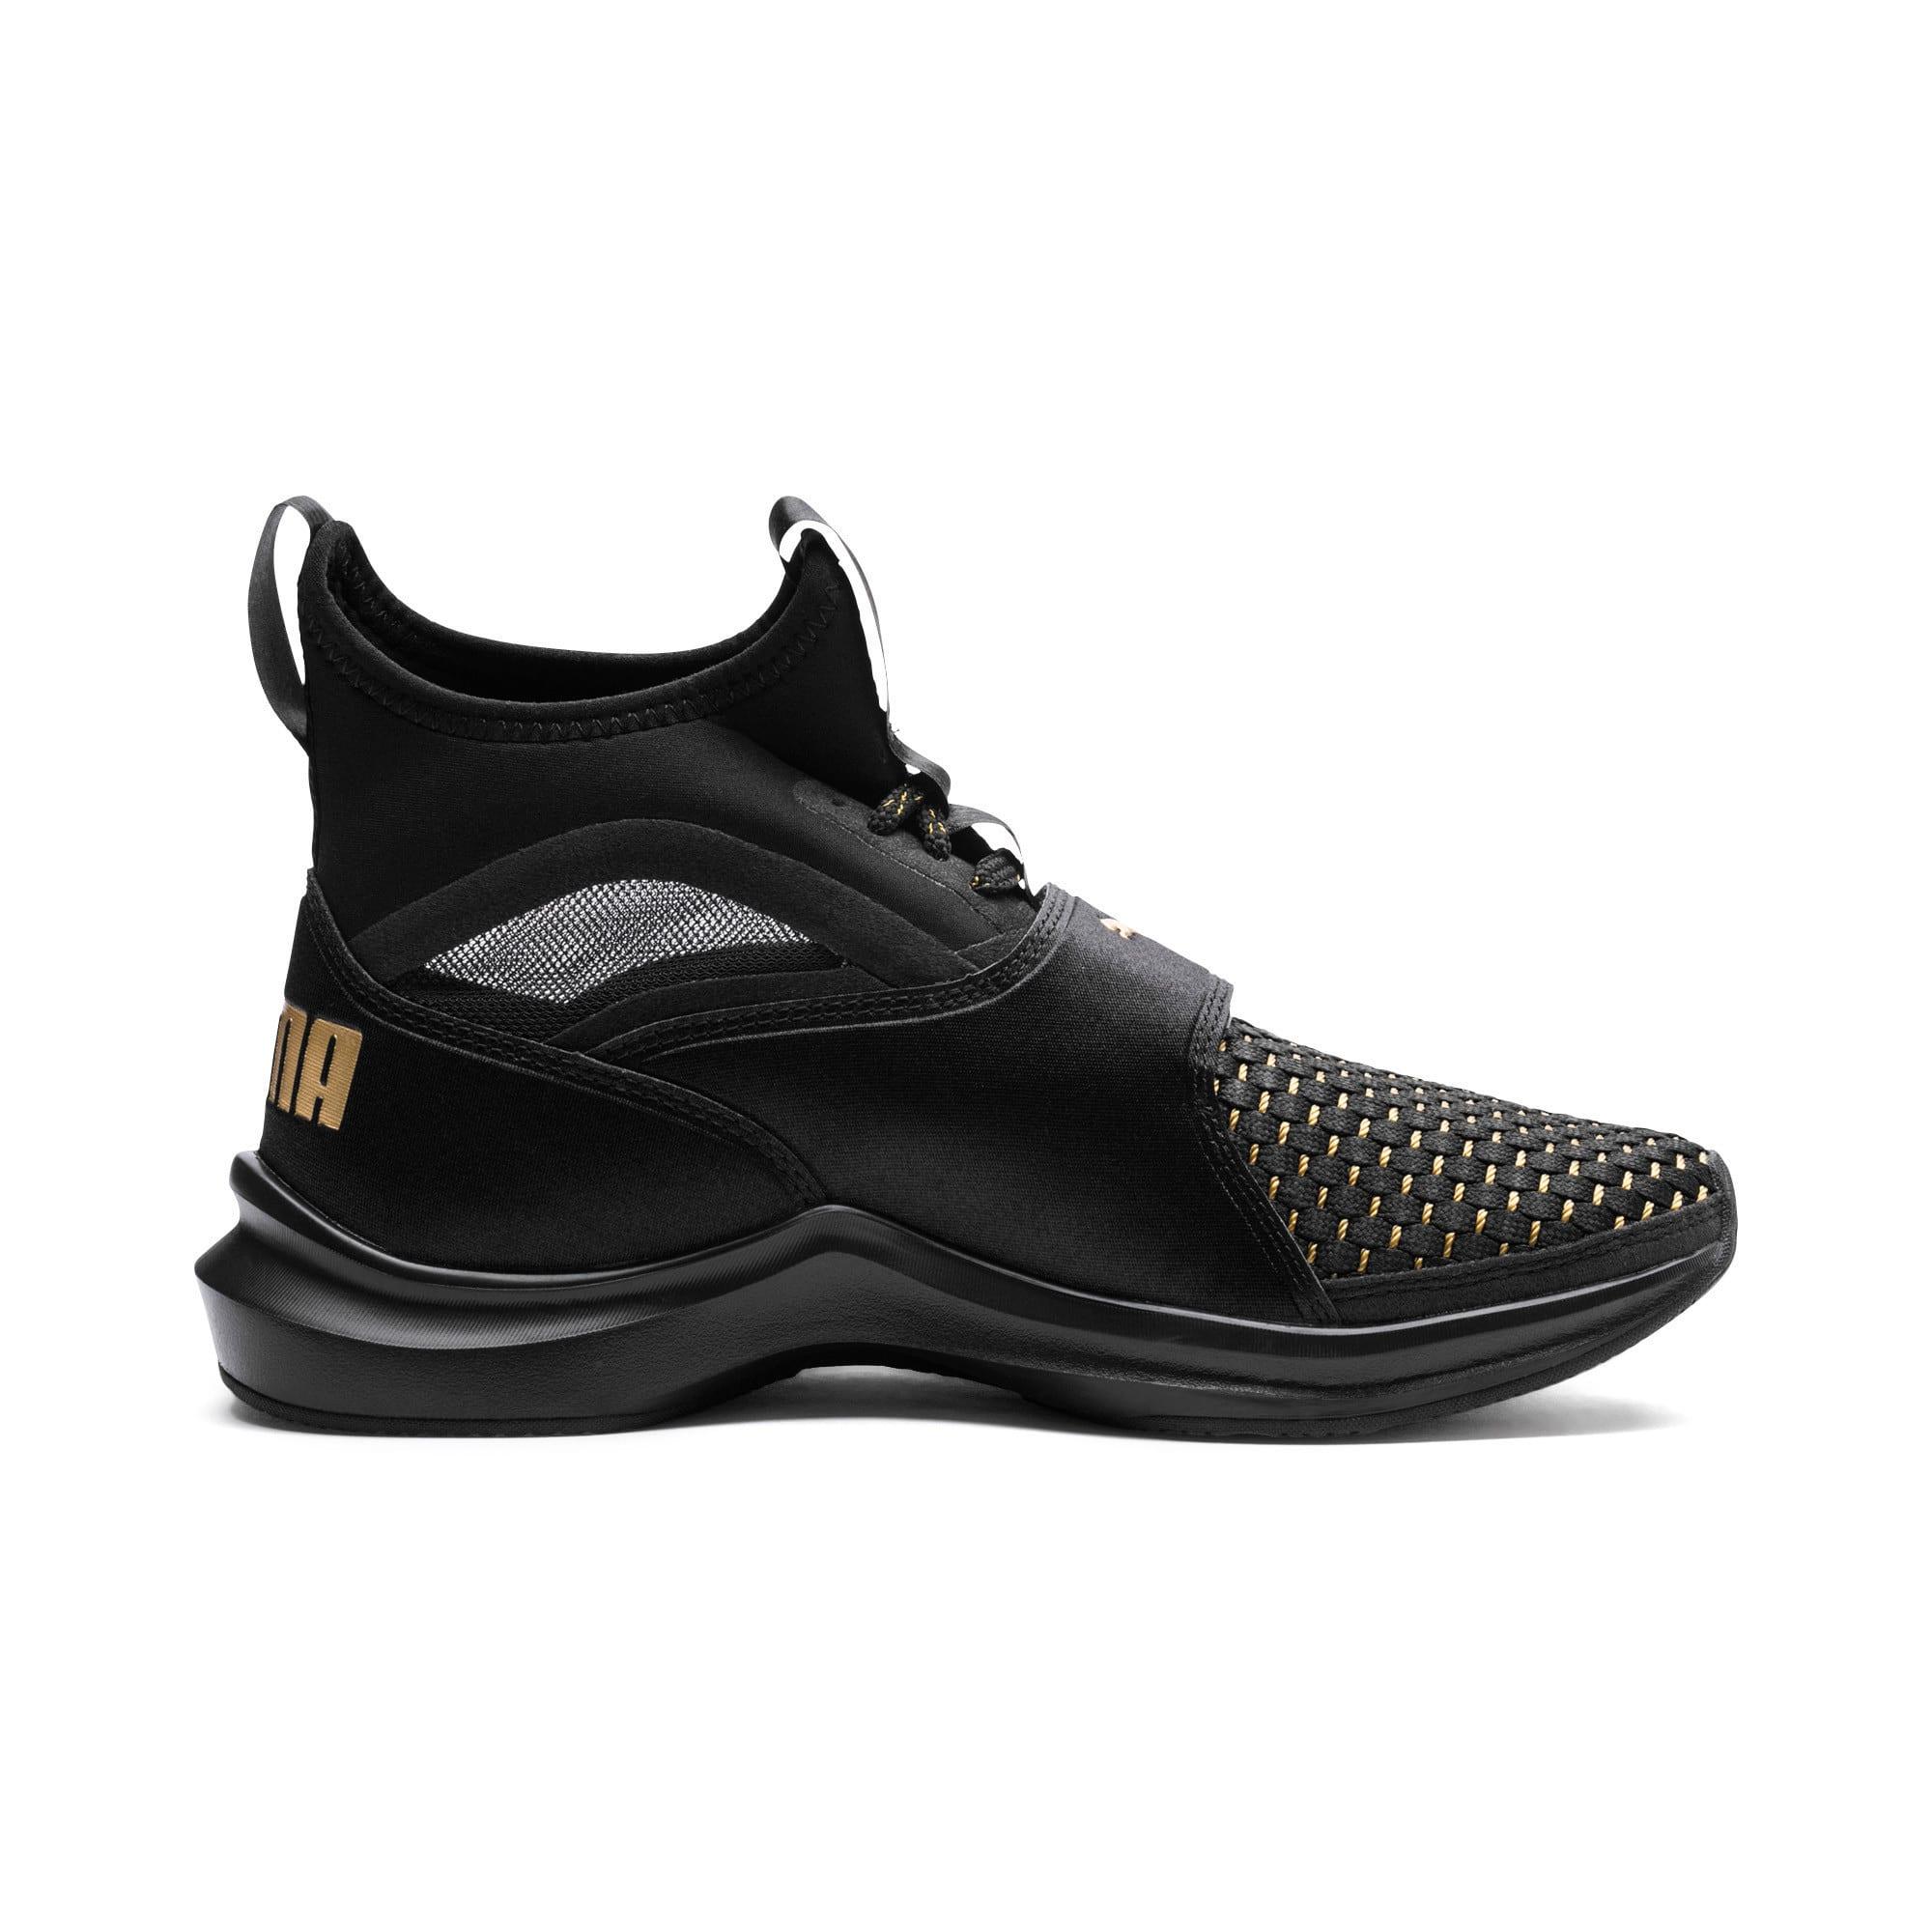 Thumbnail 4 of Phenom Varsity Women's Training Shoes, Puma Black-Puma Black, medium-IND